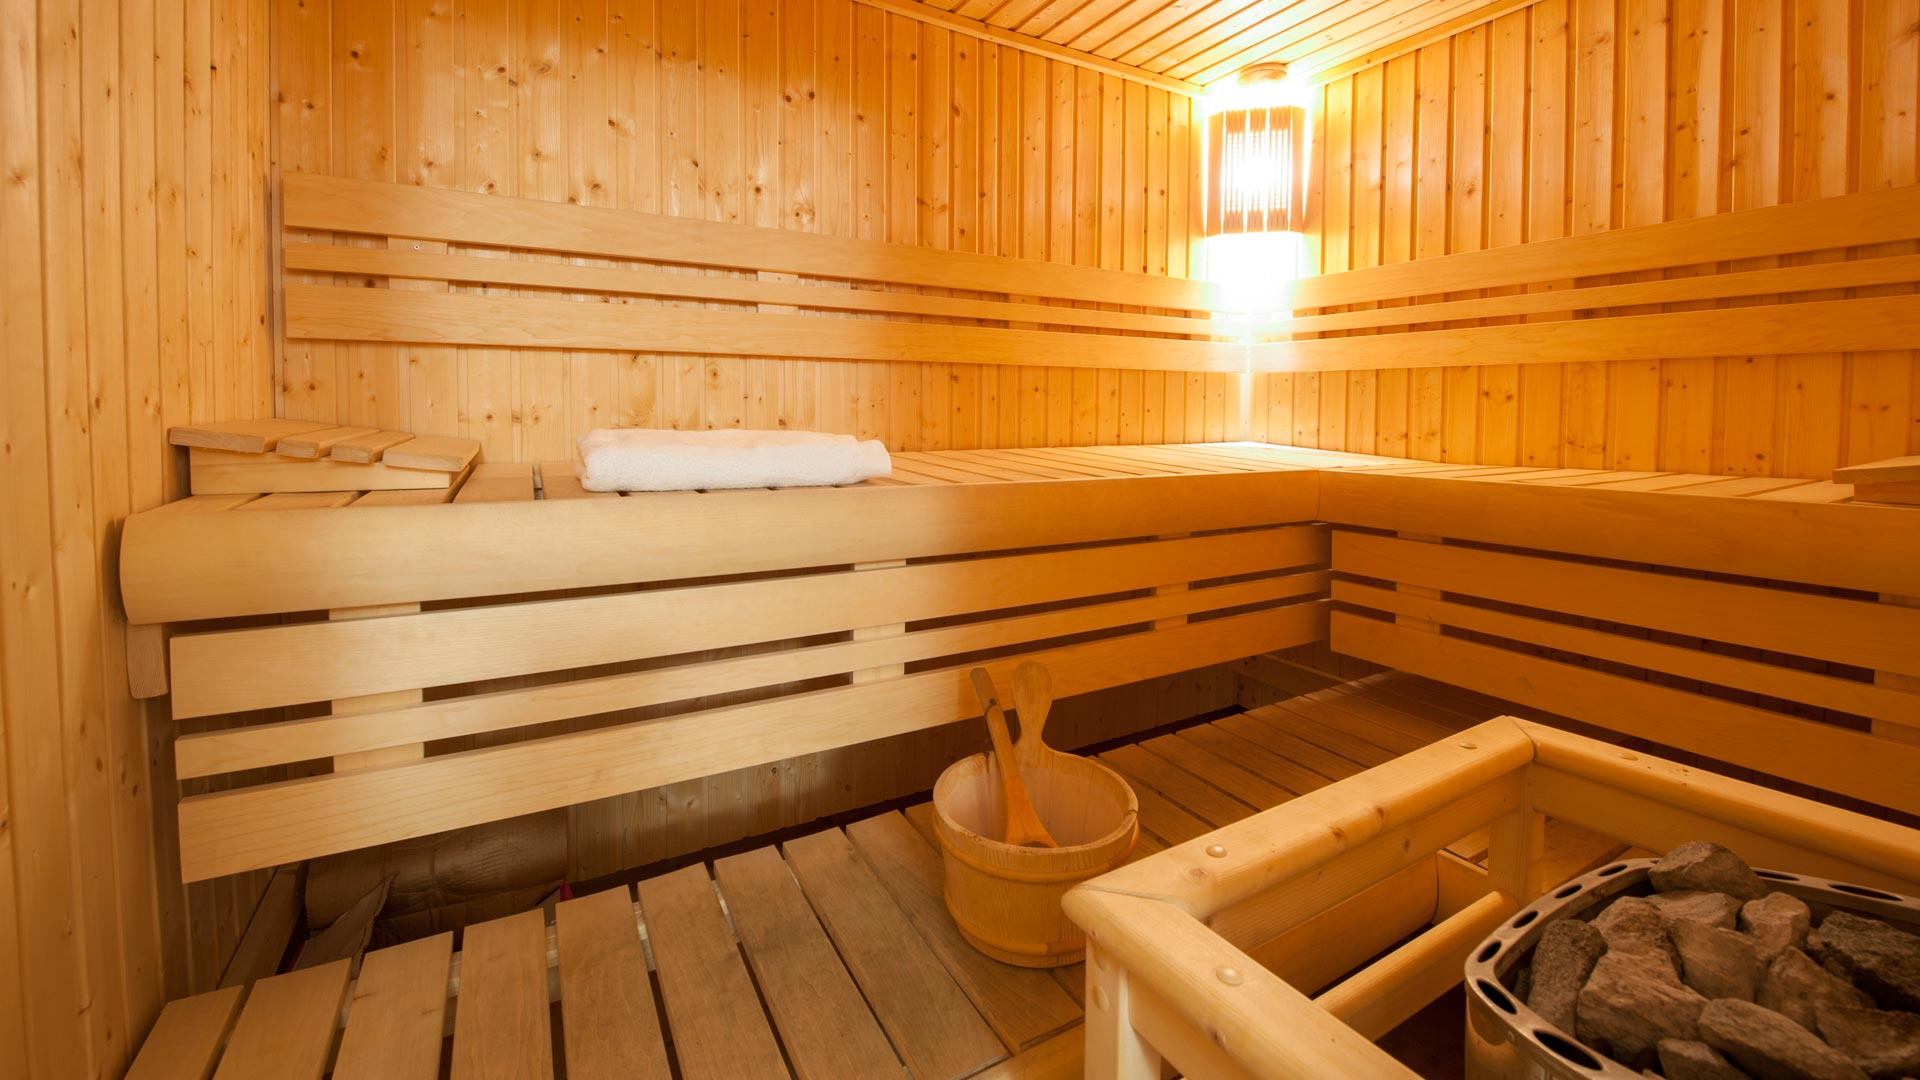 Sauna inLe Refuge Chalet in Ste Foy